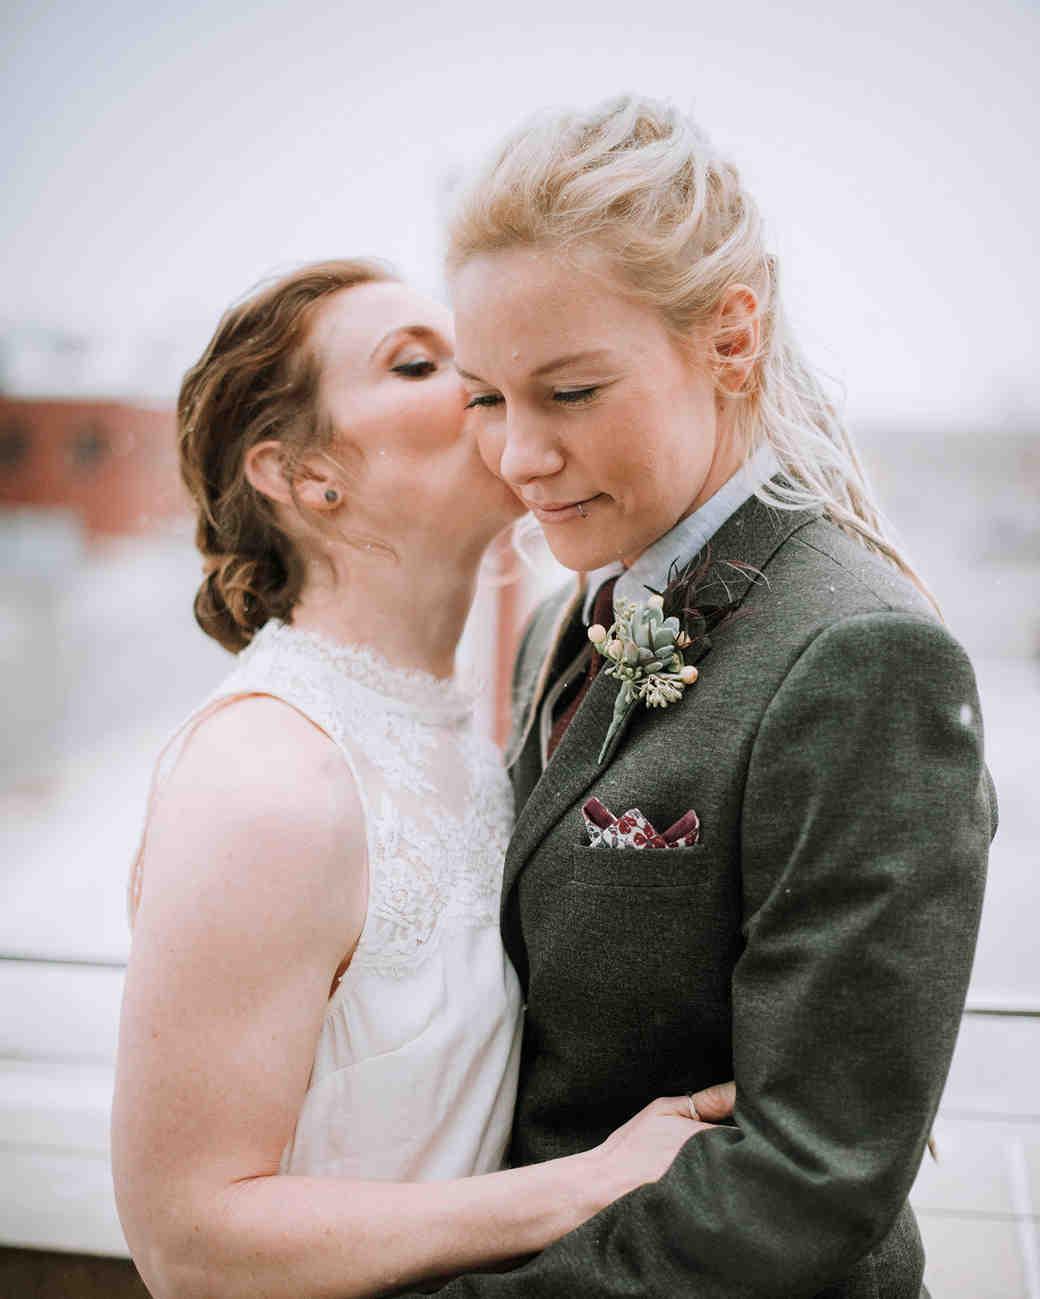 bride kissing wife on cheek